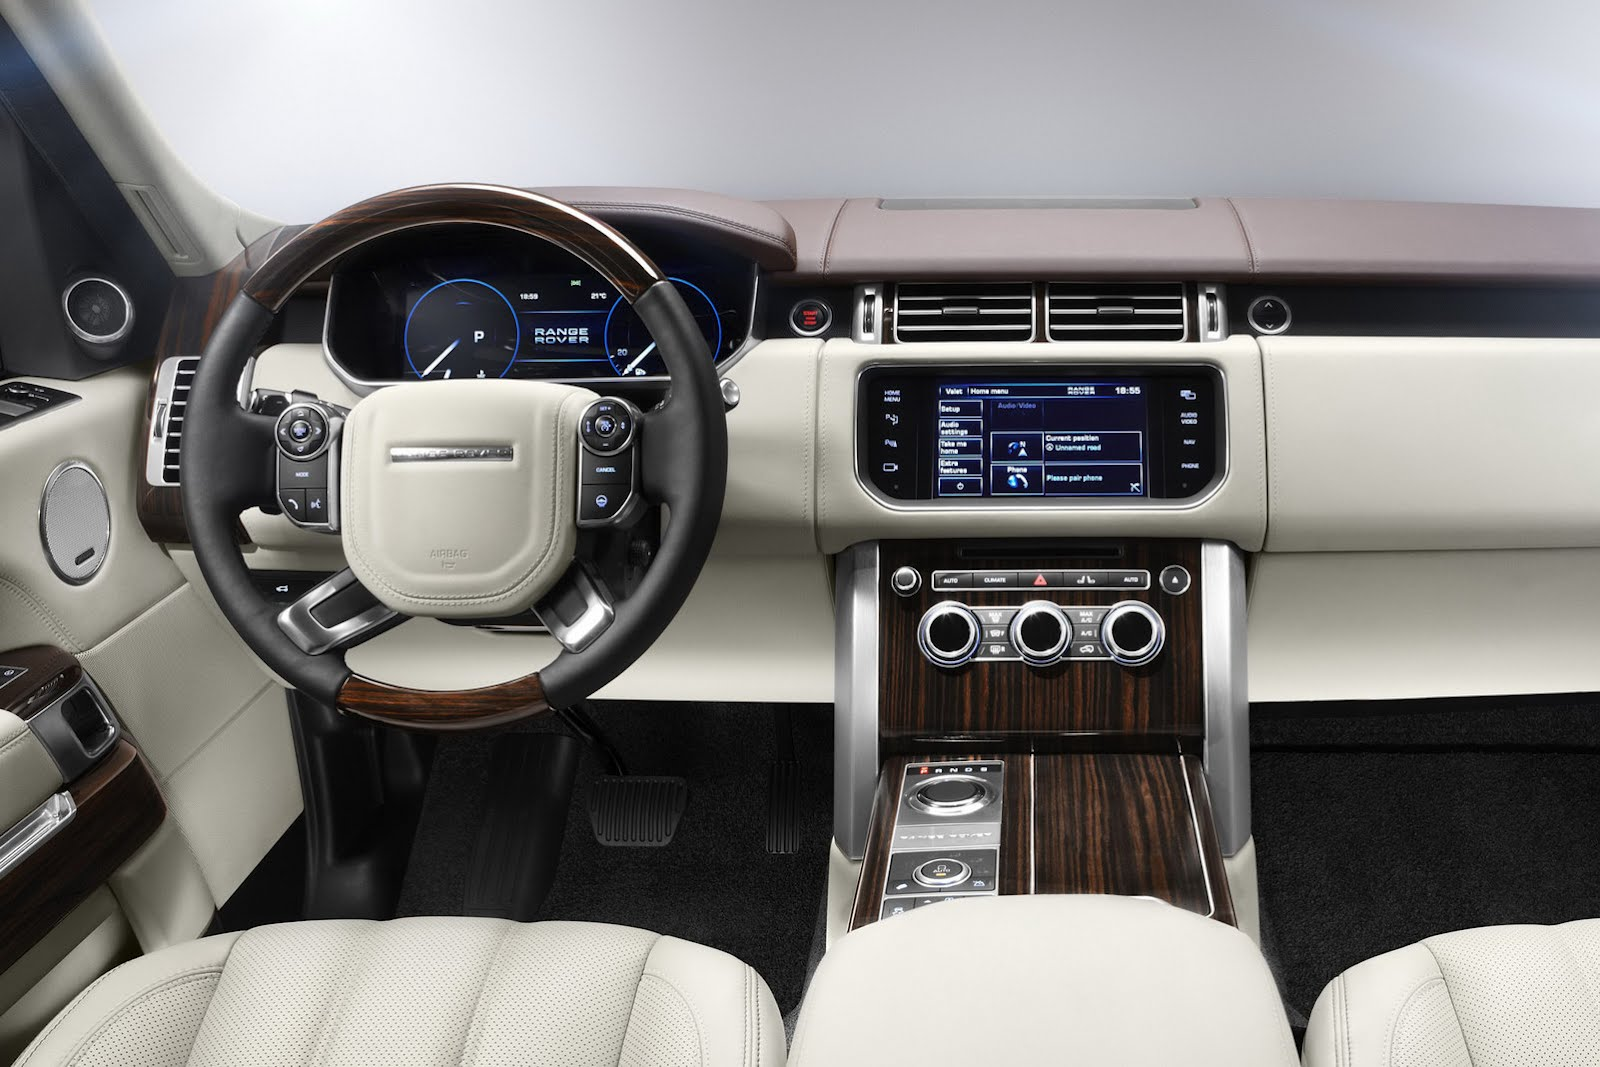 2014 Range Rover Evoque Vs Bmw X3 Vehicle Comparison